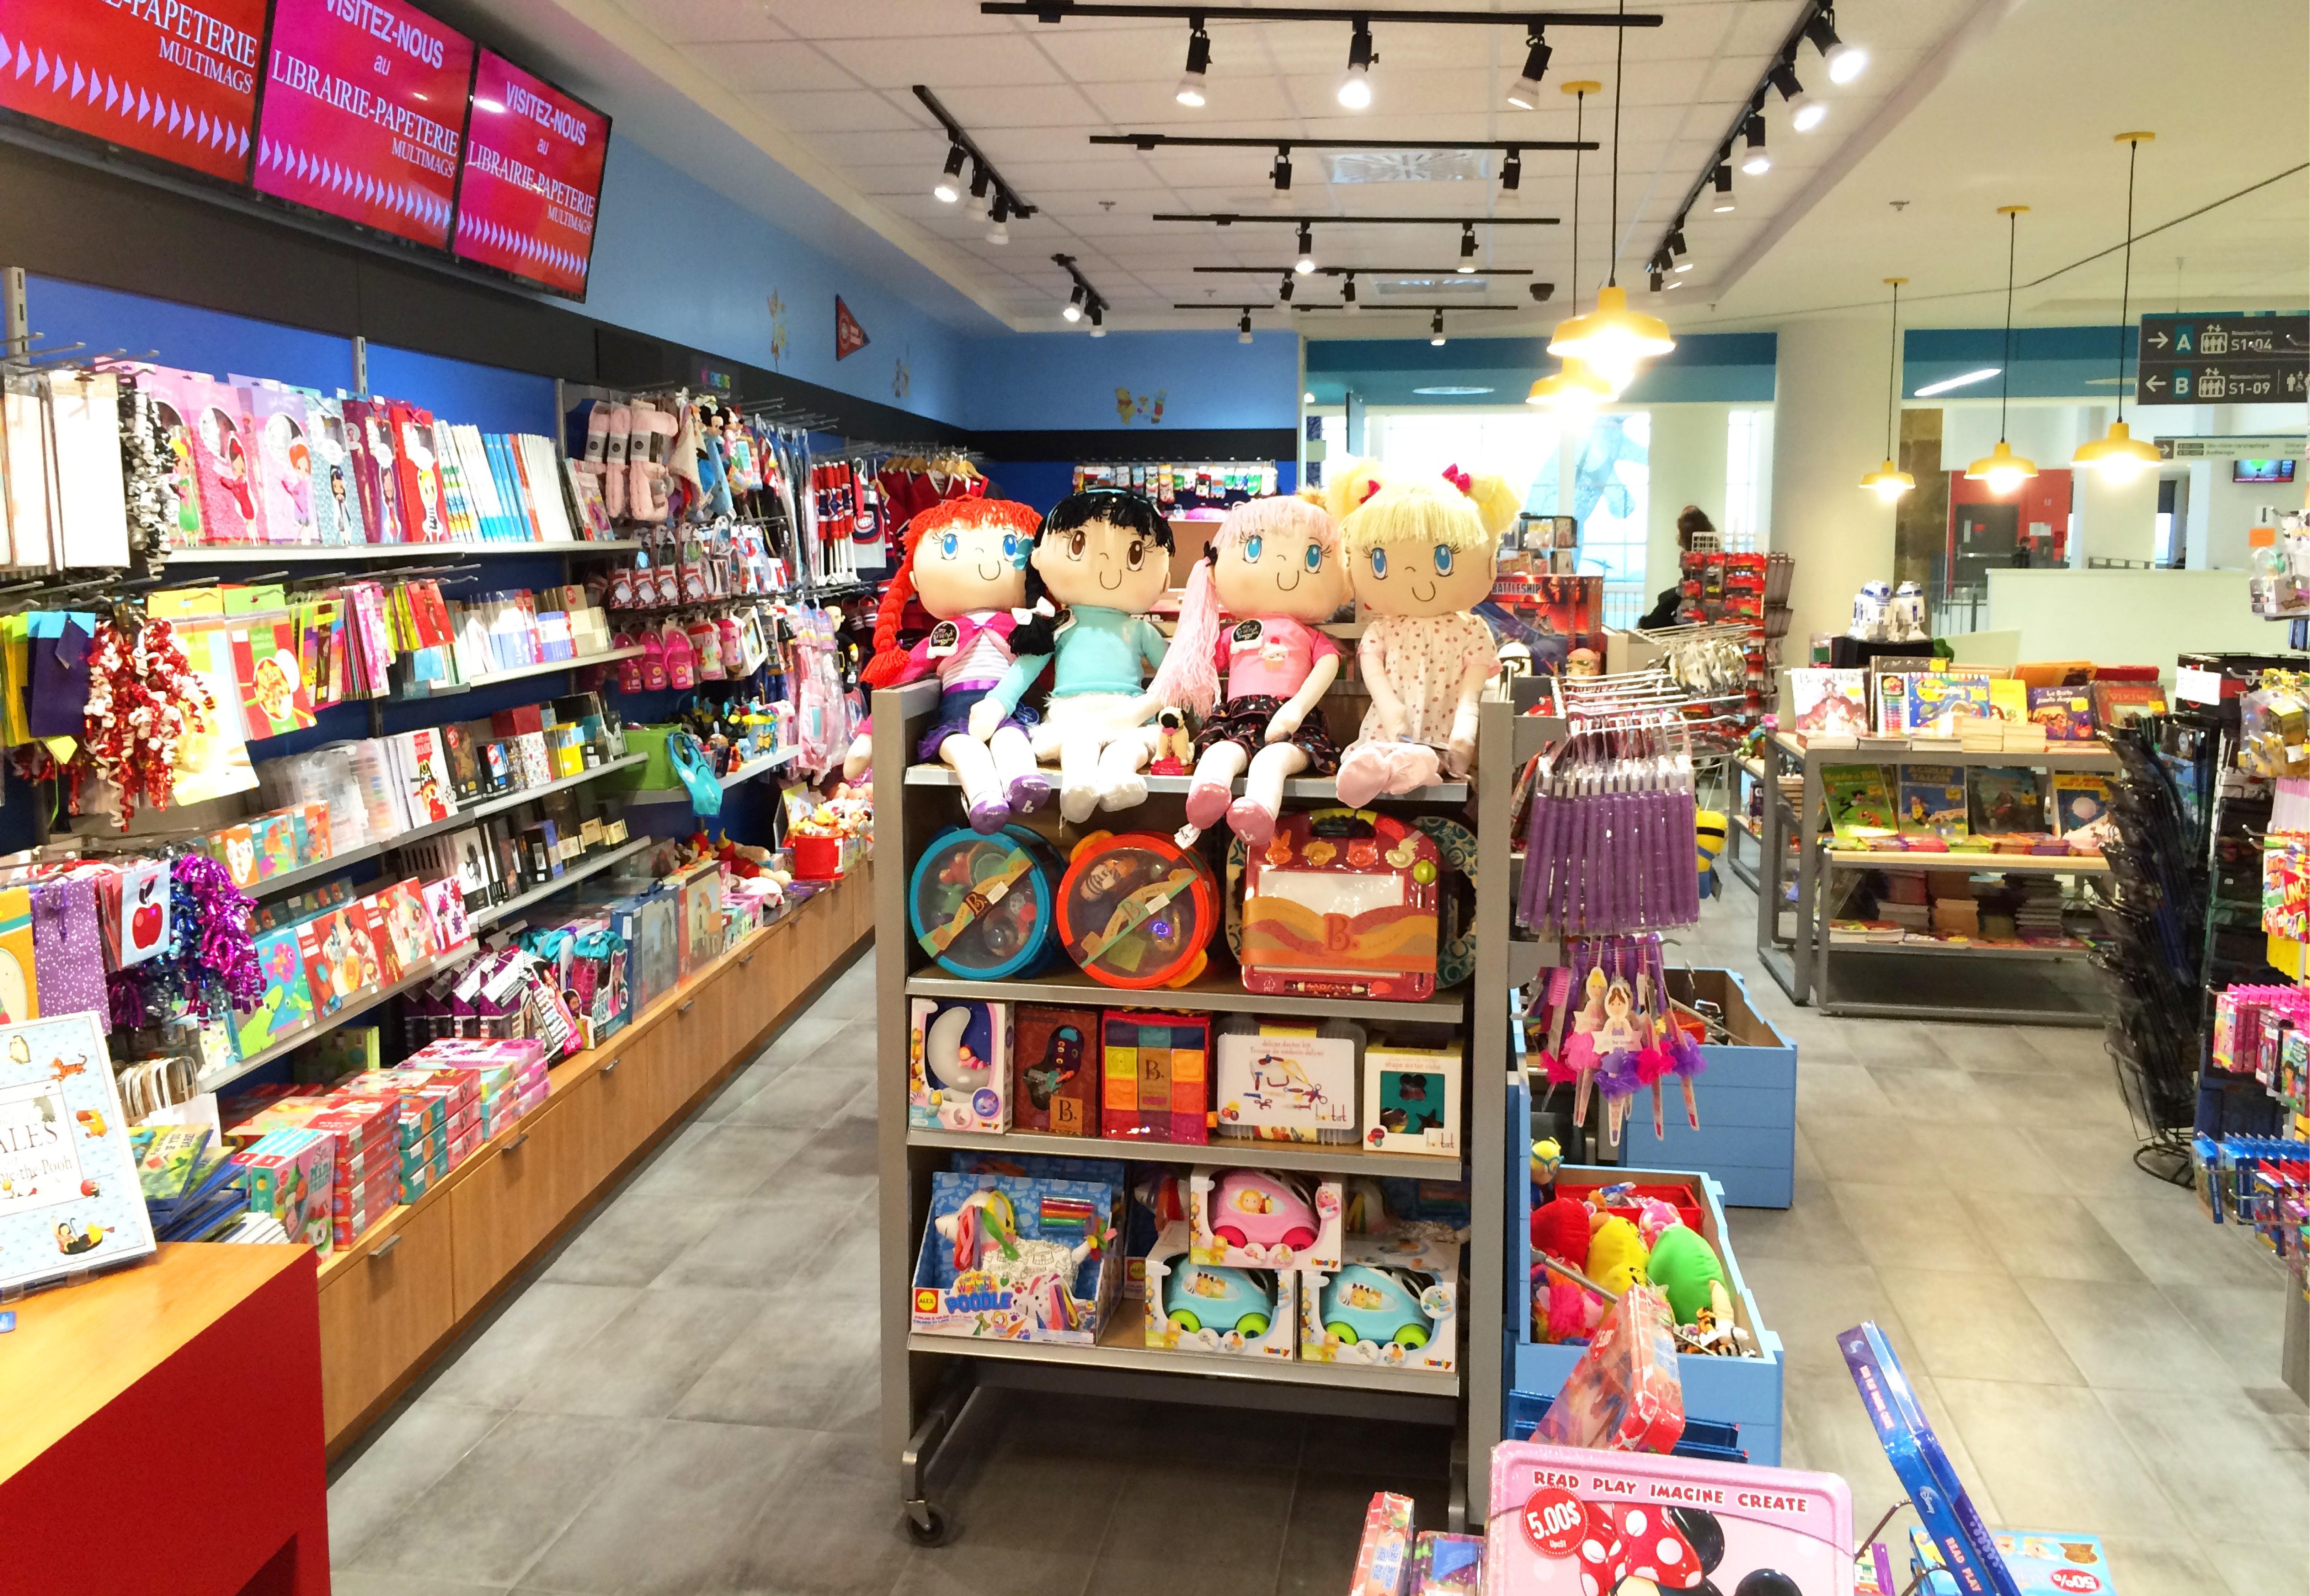 Multimags passe temps jouets store cusm montr al for Jouetstore